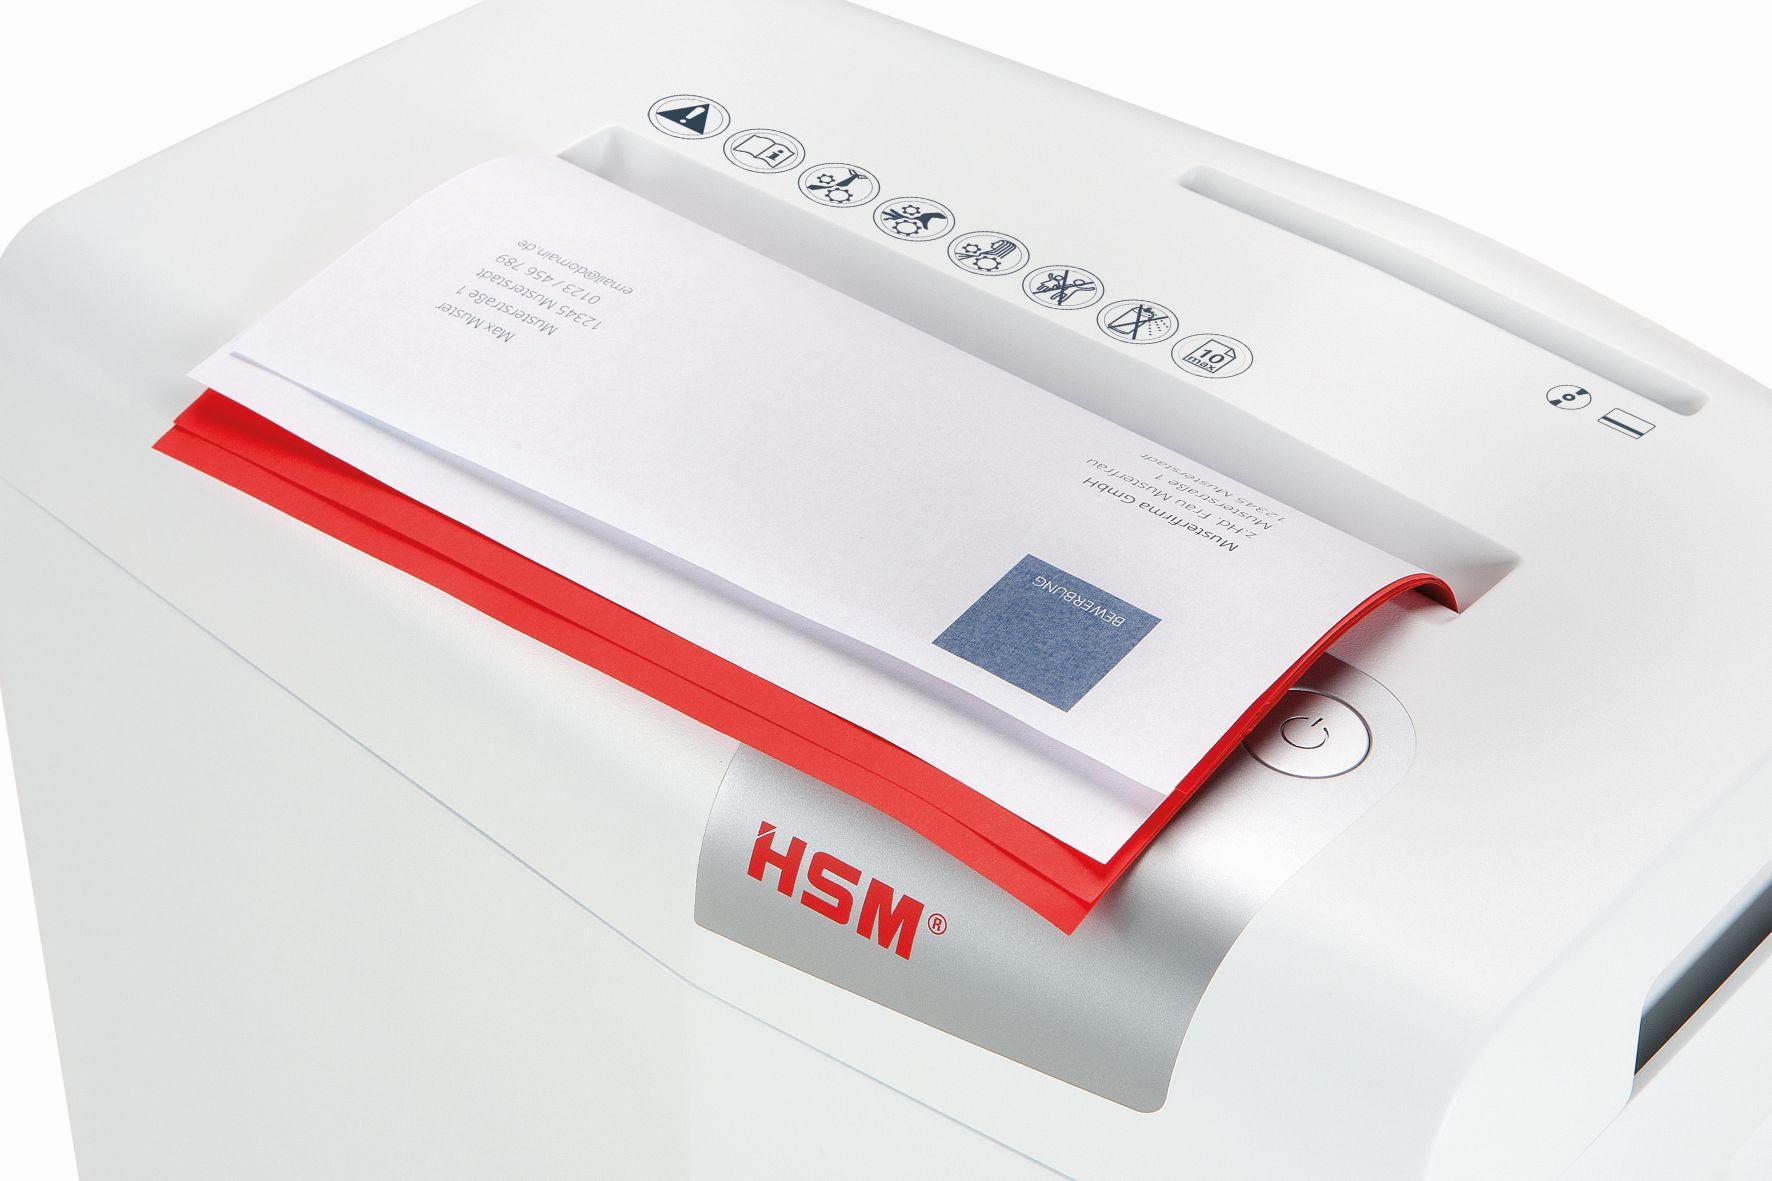 HSM-shredstar-S10-D5-JPG